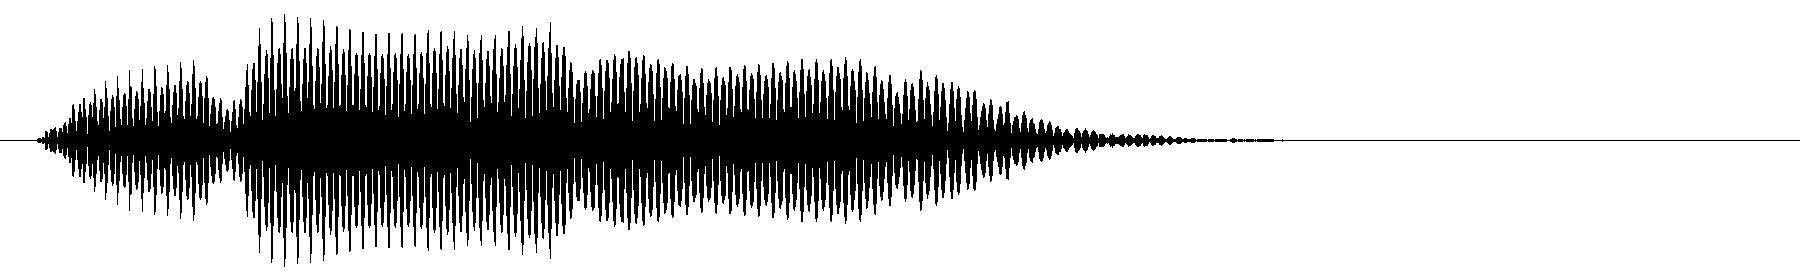 alvinbary 05